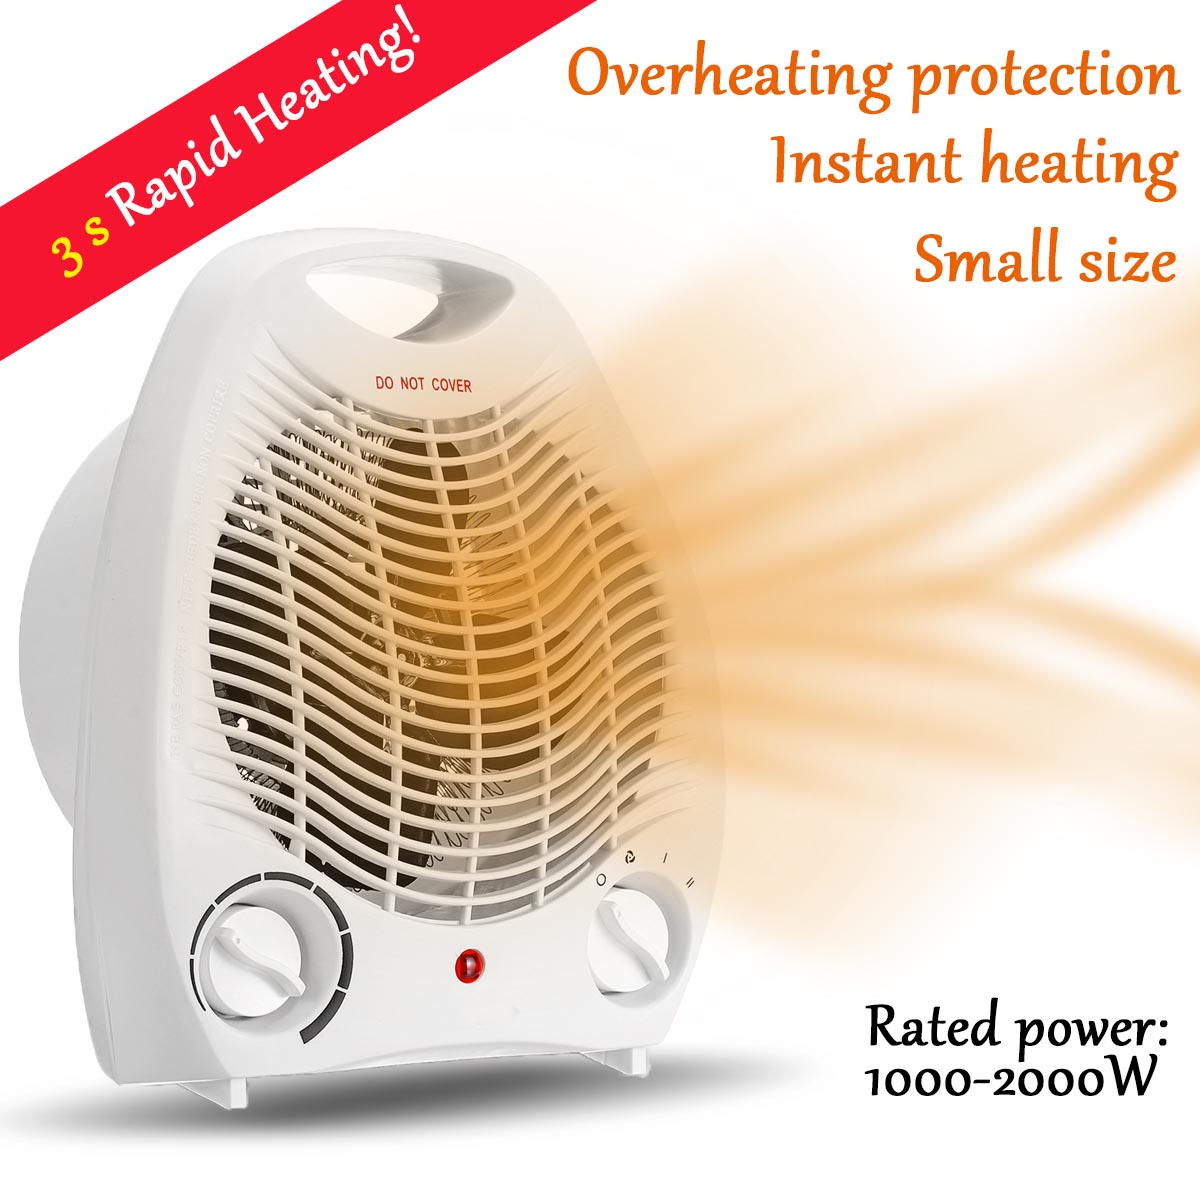 2000W Portable Electric Space Heater Fan 220V Eersonal Space Warmer Electric Radiator 3 Heating Setting Winter Warmer Machine